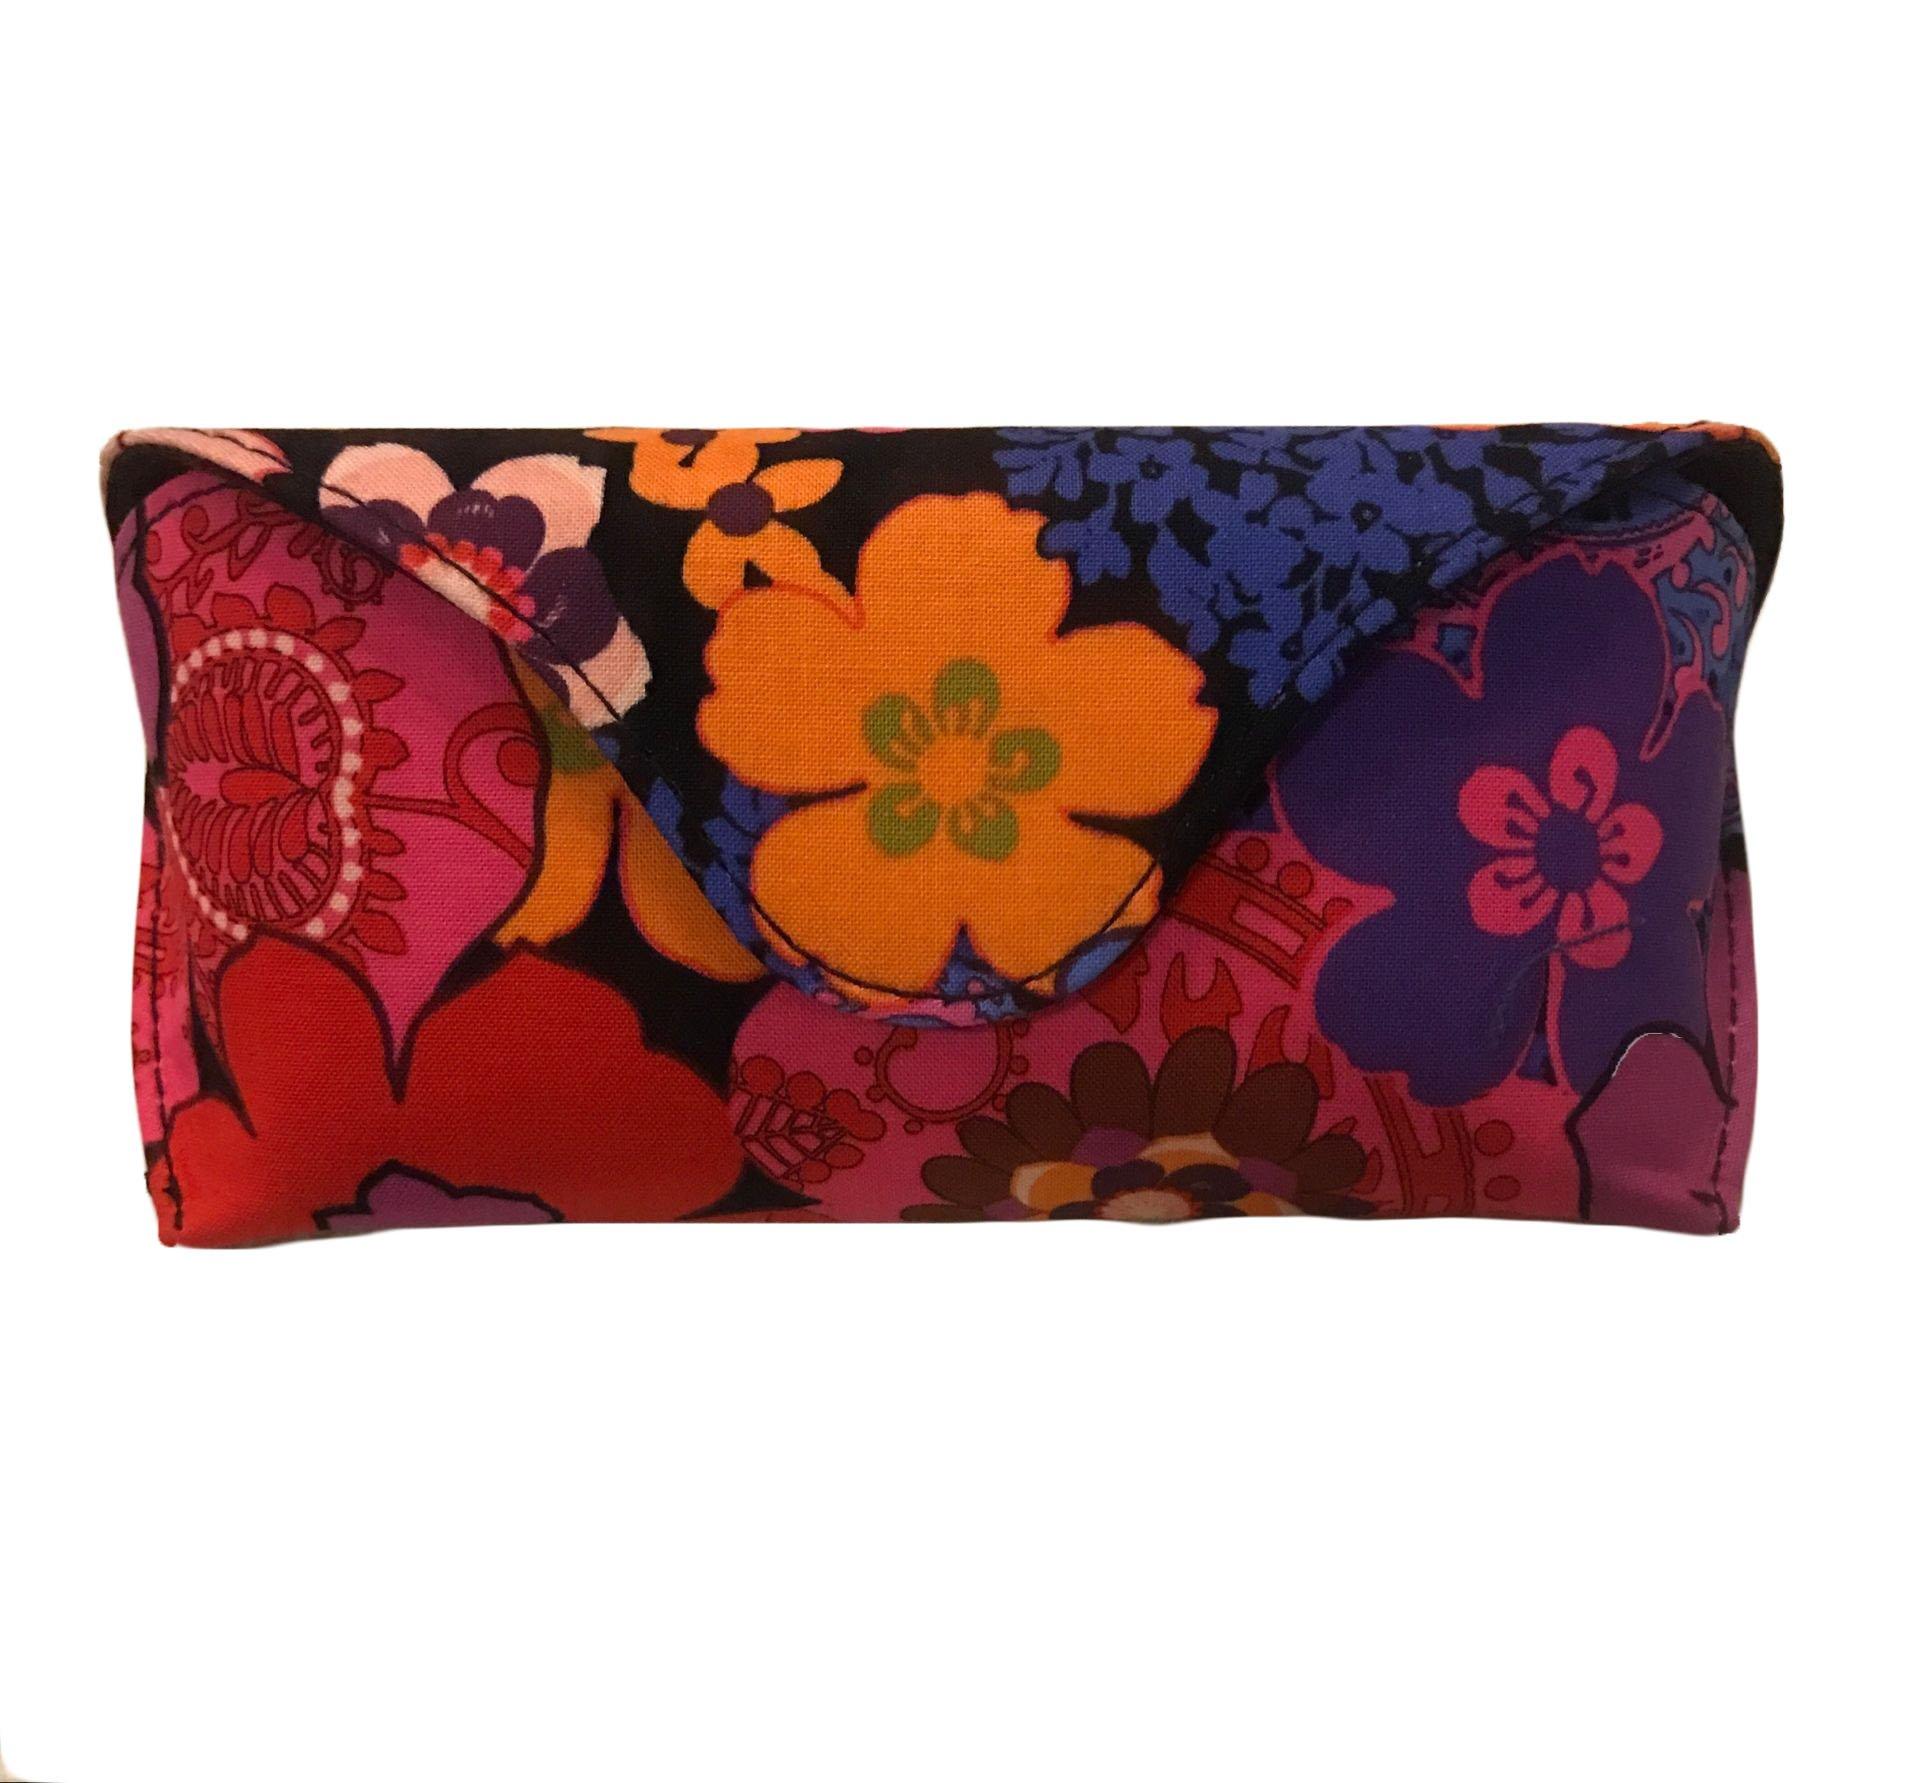 Vera Bradley Sunglass / Eyeglass Case in Floral Fiesta by Vera Bradley